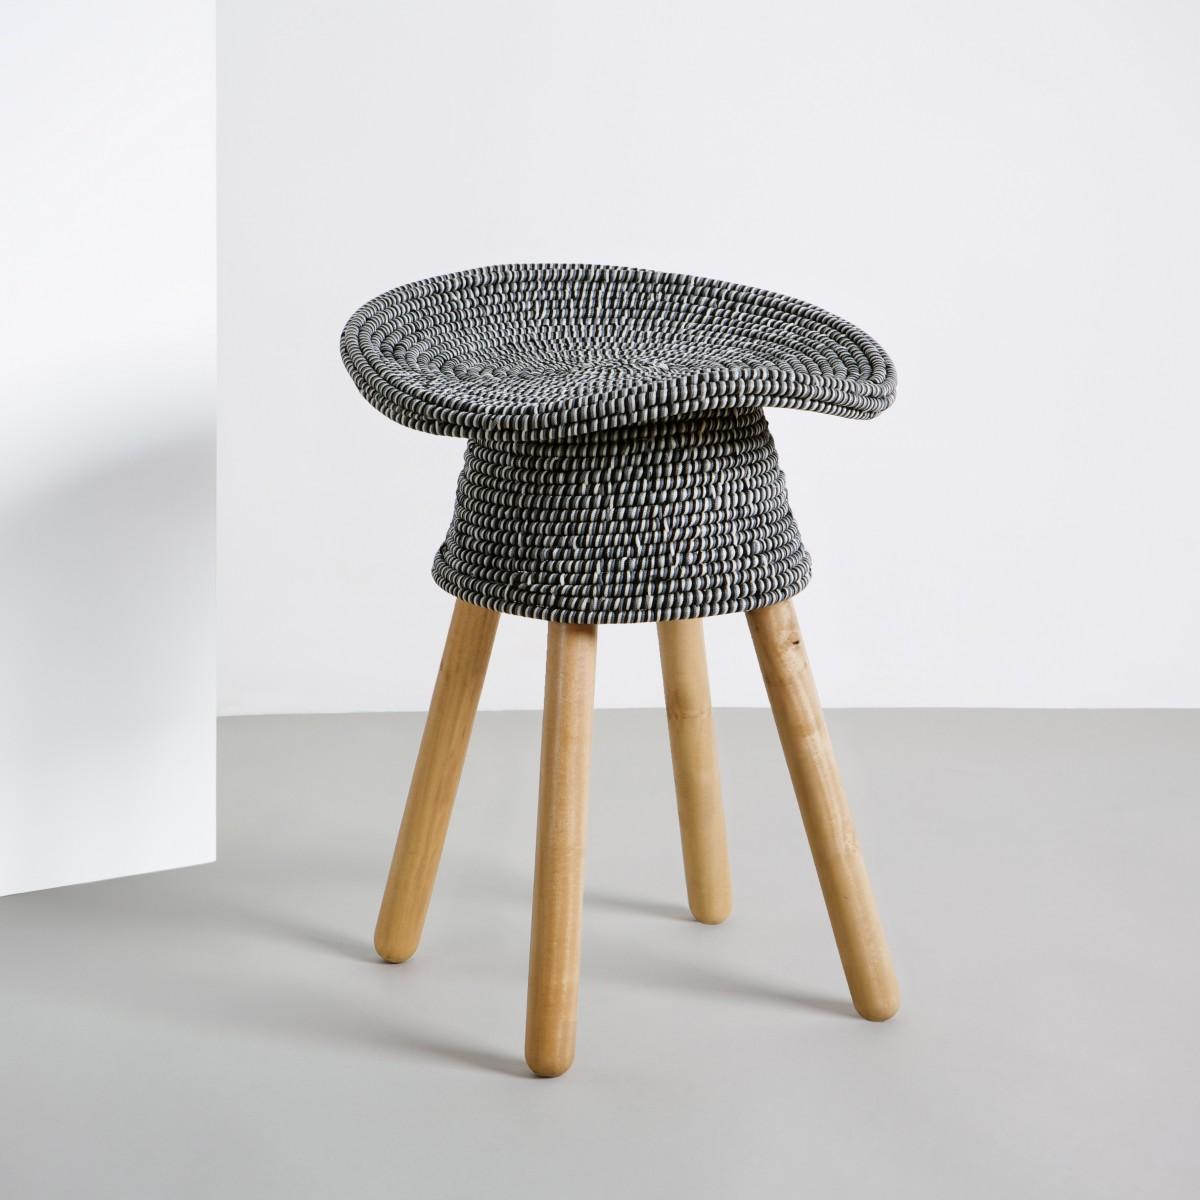 880240-255-coiled_stool-001_2.jpg